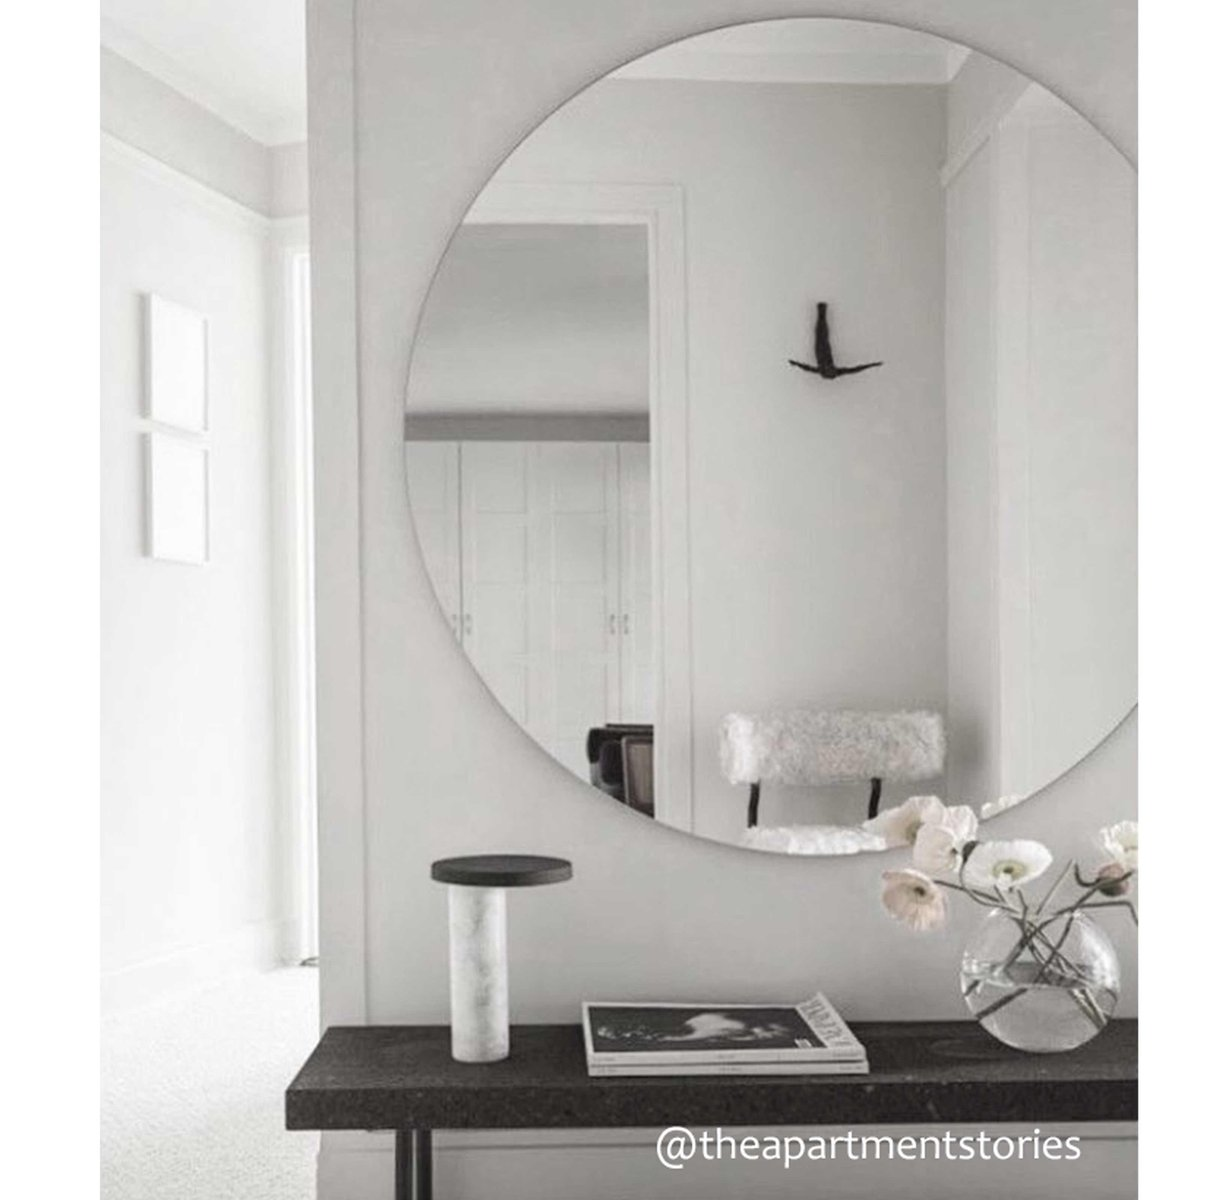 runder extra gro er versilberter orbis spiegel ohne rahmen. Black Bedroom Furniture Sets. Home Design Ideas